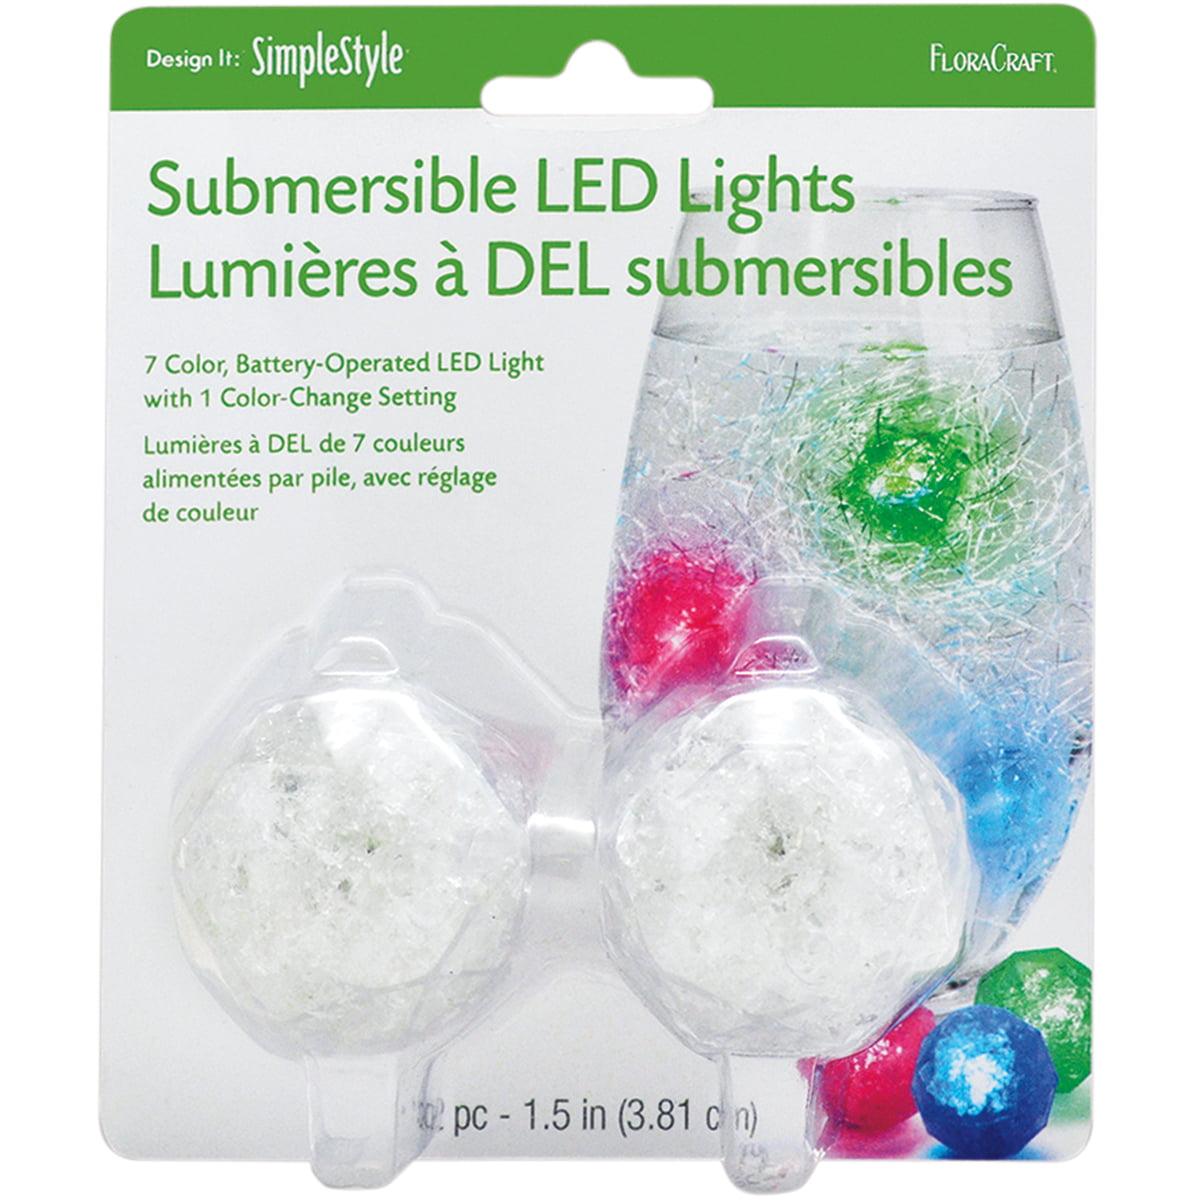 FloraCraft Submersible LED Lights